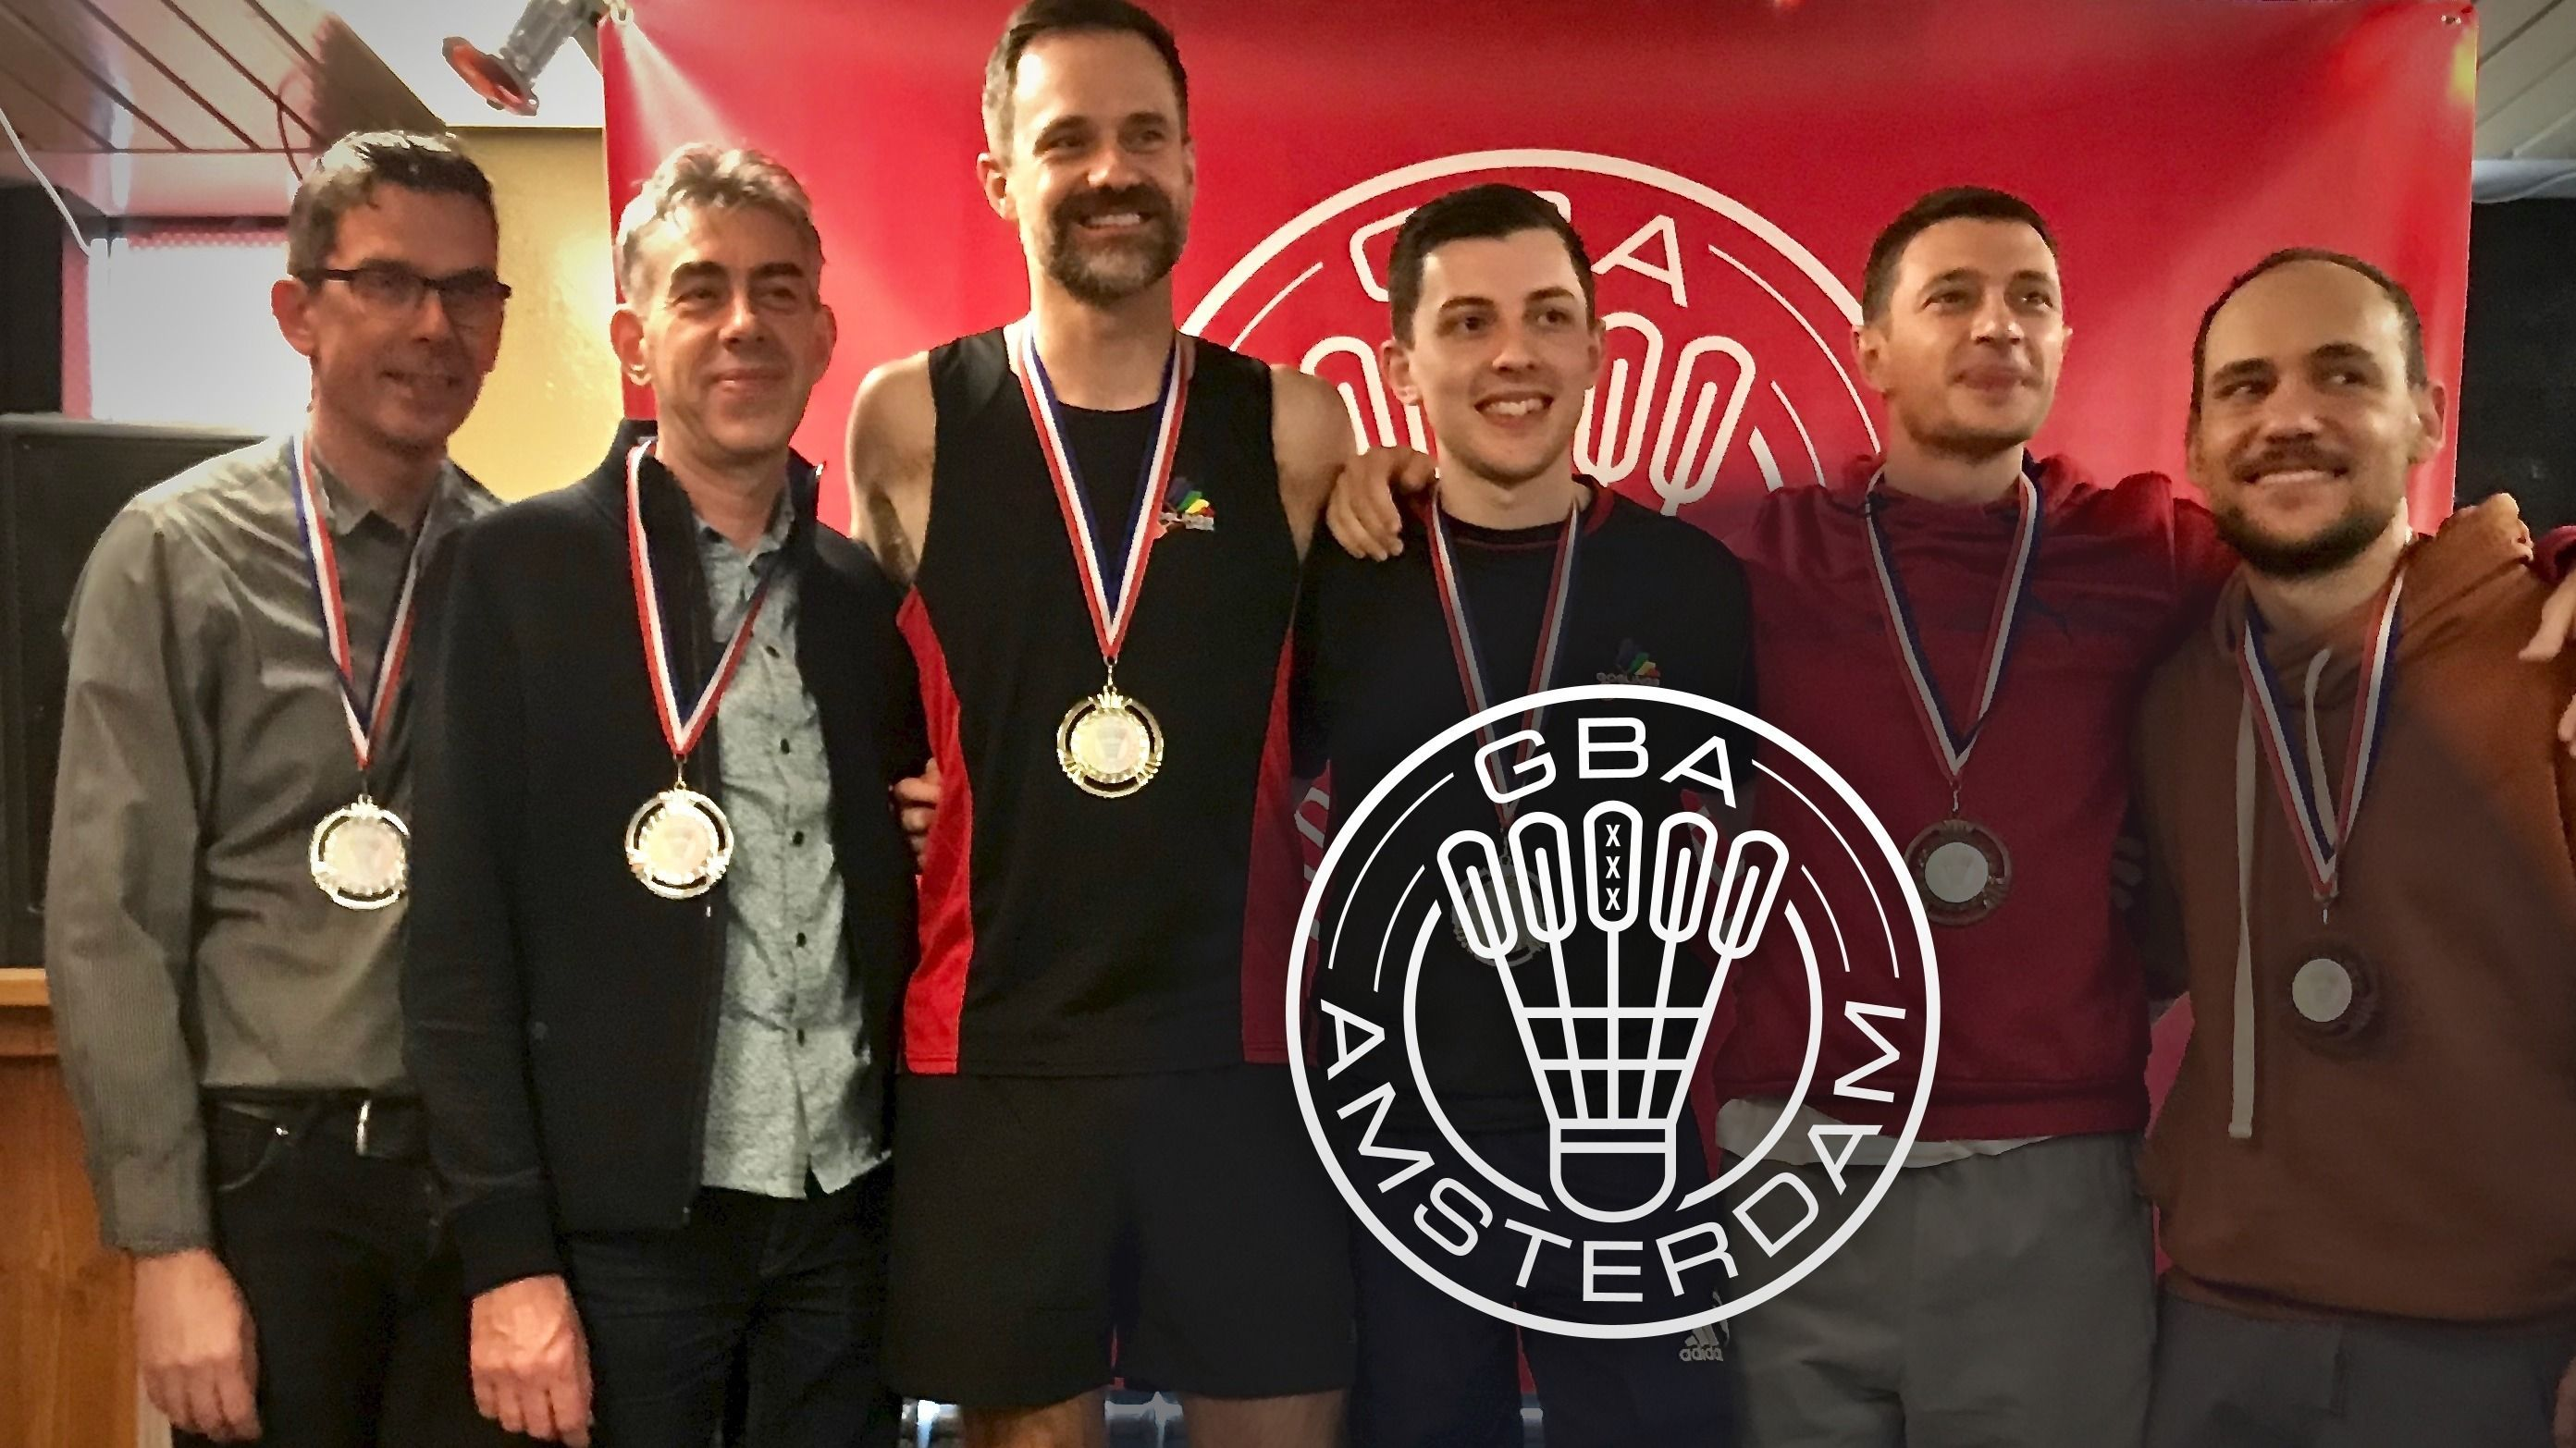 Gay Badminton Amsterdam (GBA)